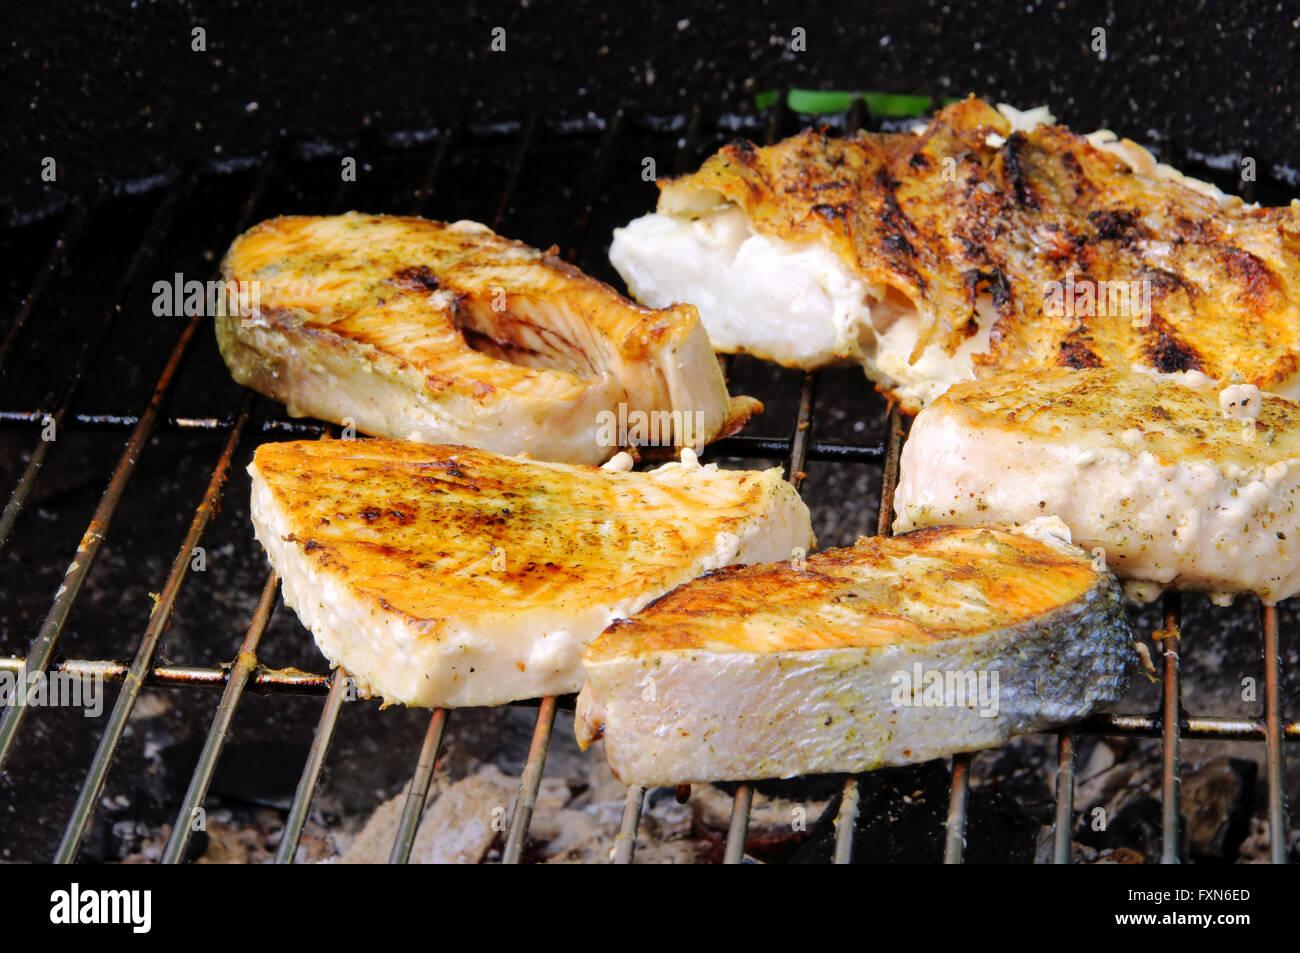 Grillen Fischsteak - grilling steak from fish 07 - Stock Image